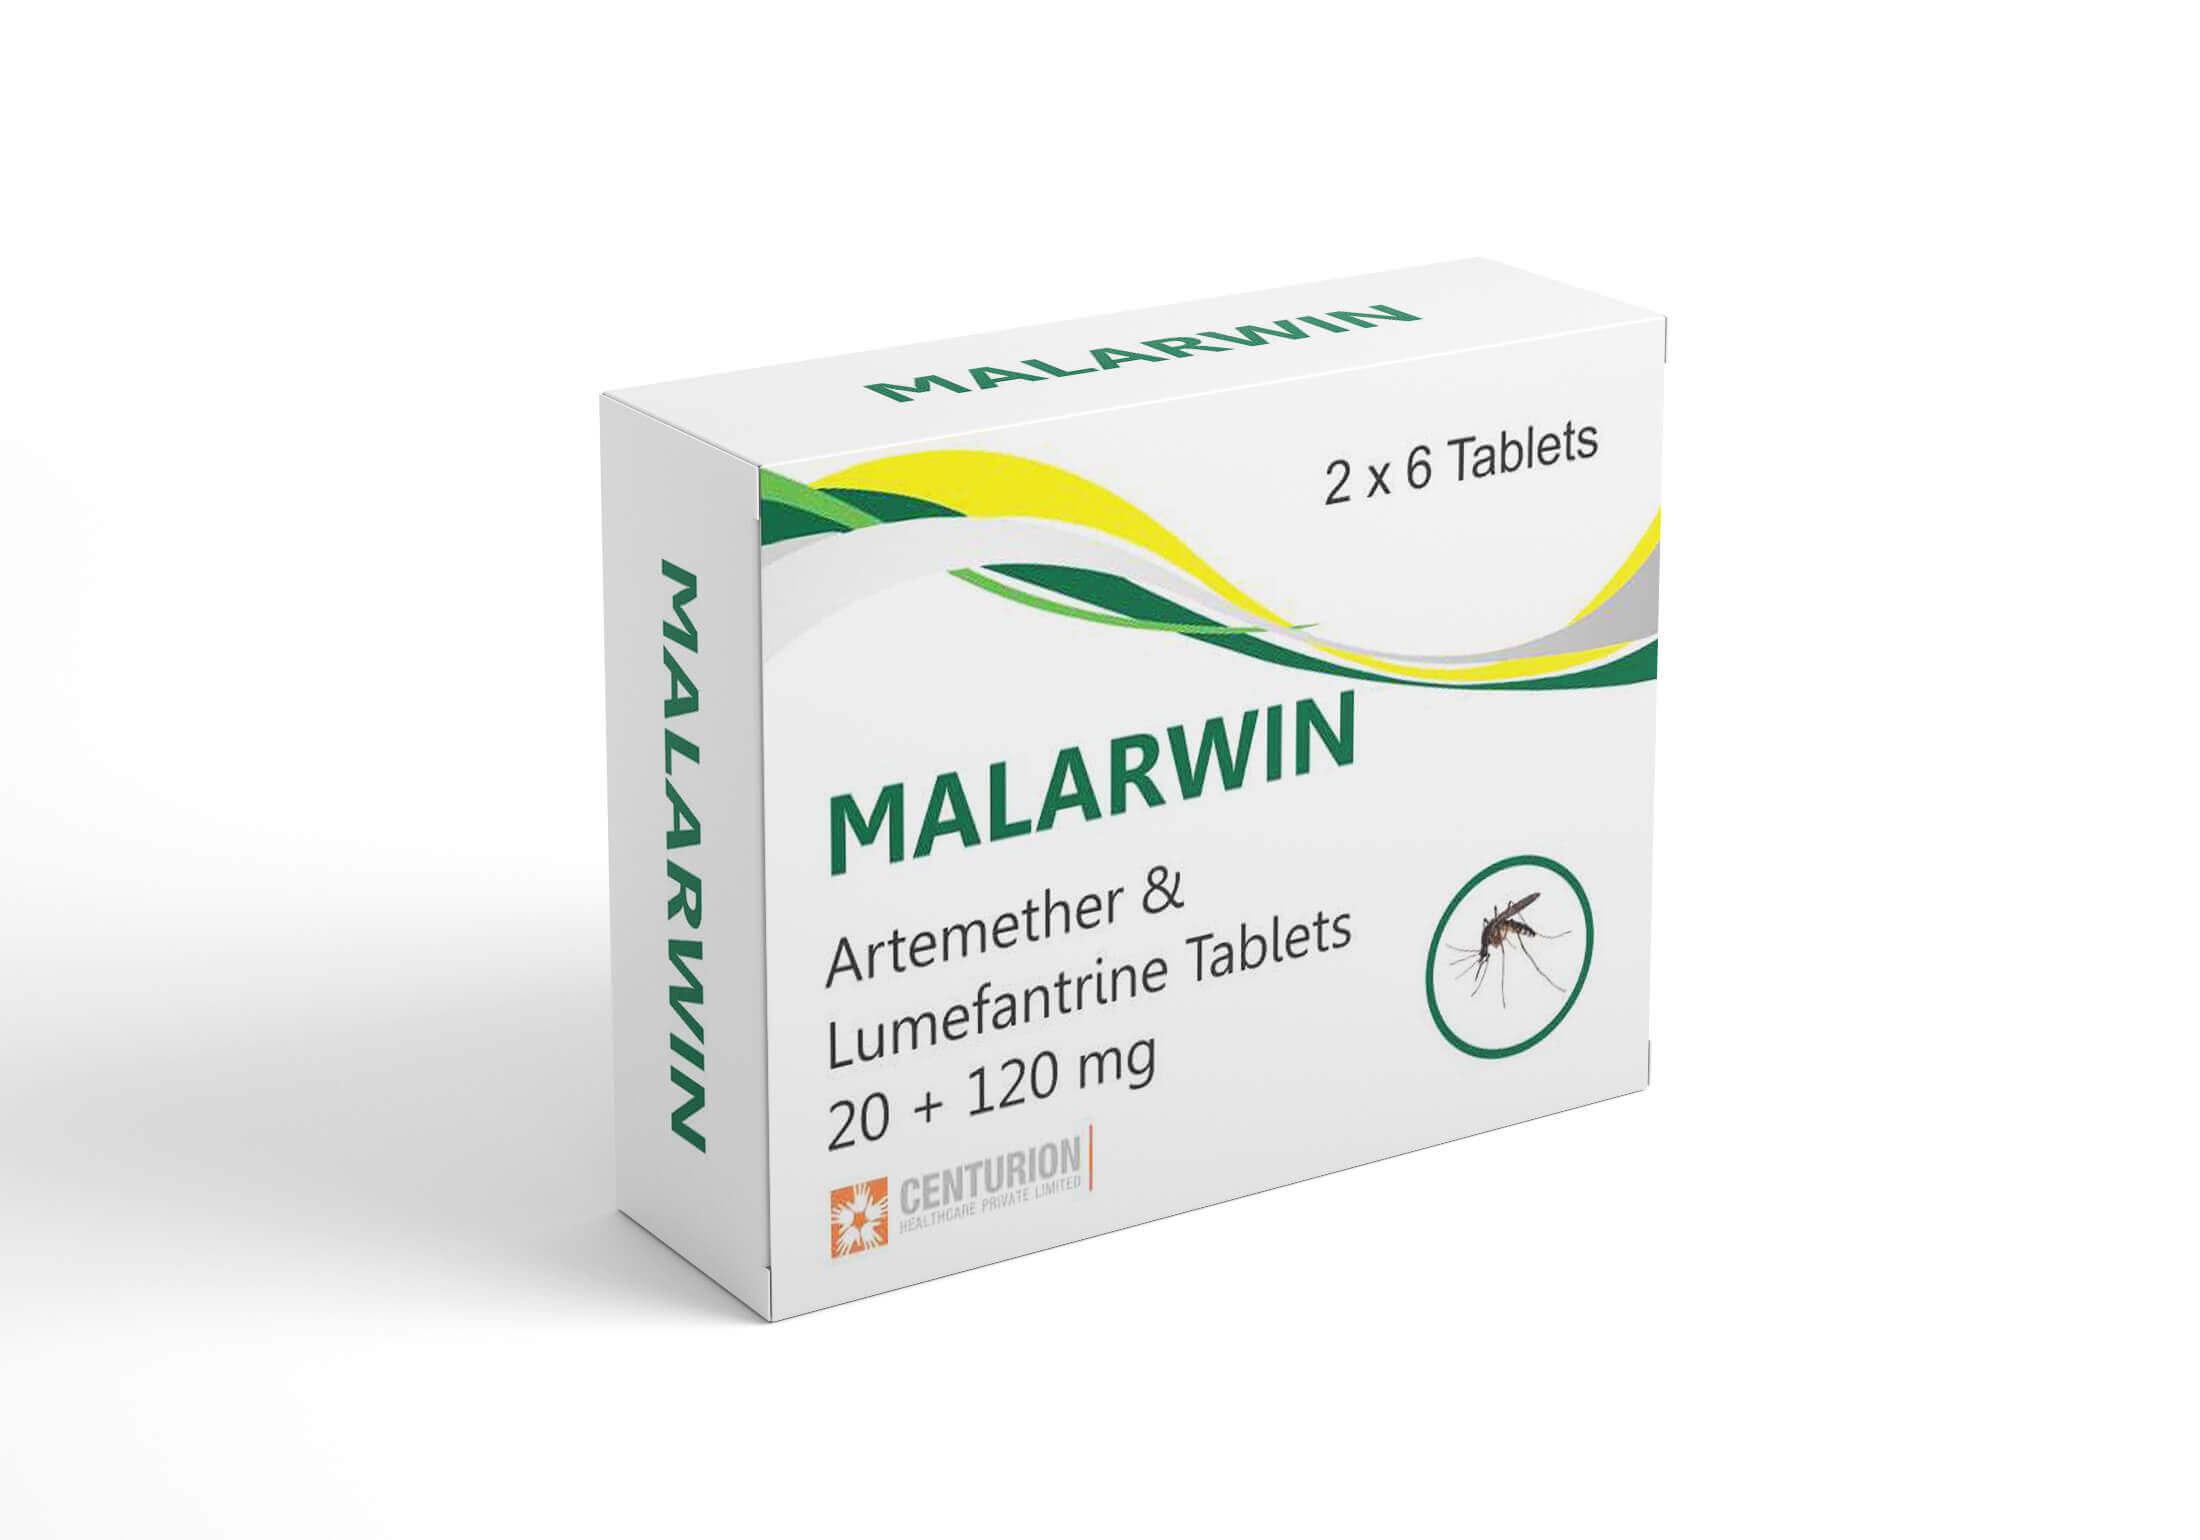 Artemether Lumefantrine Tablets 20 120 mg